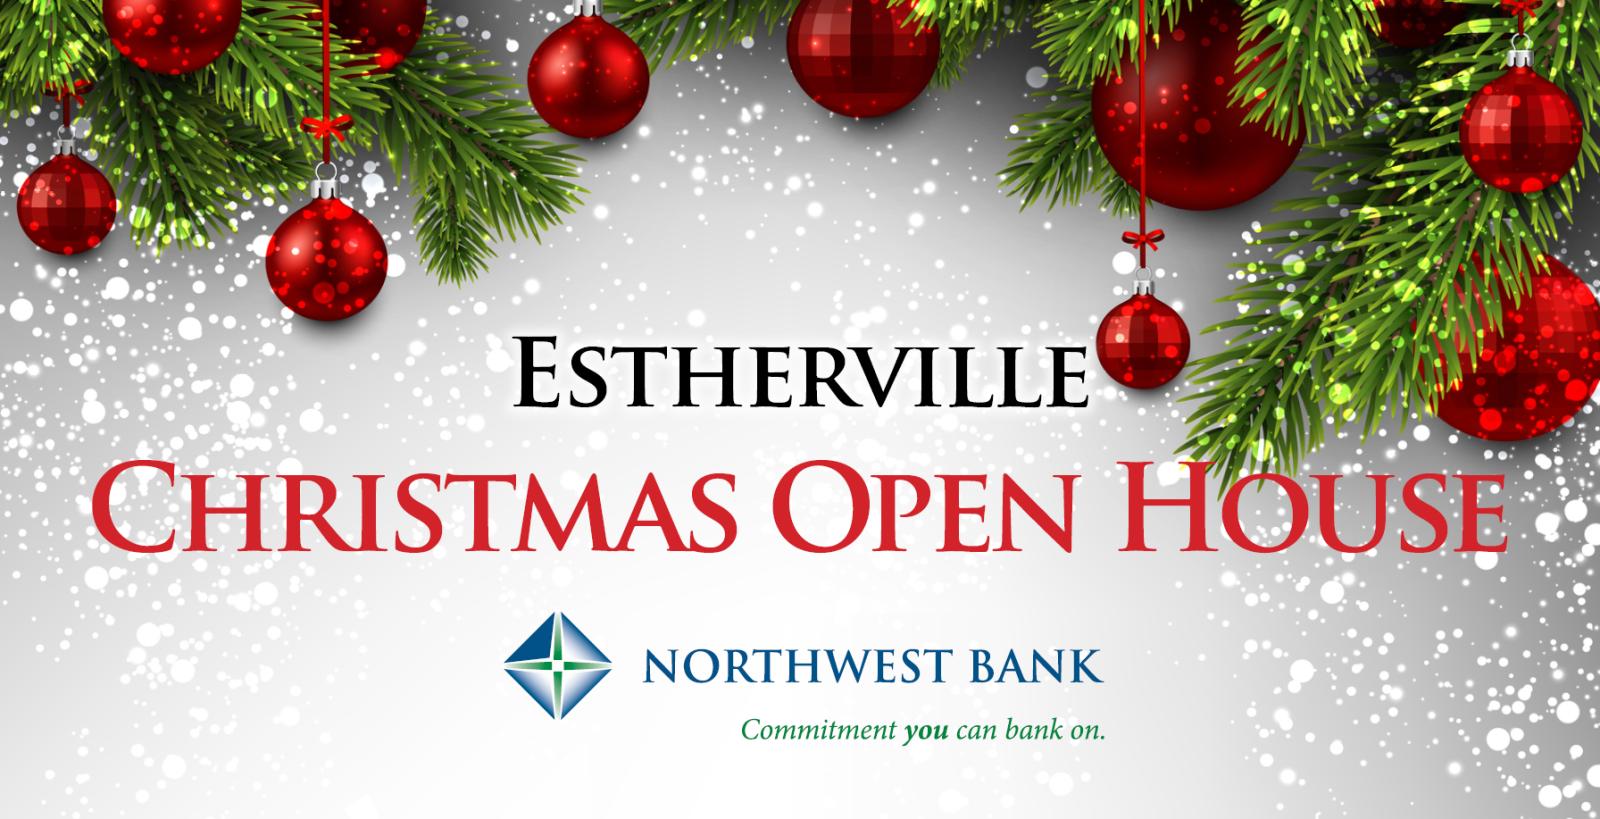 Christmas Open House.Estherville Christmas Open House Estherville Christmas